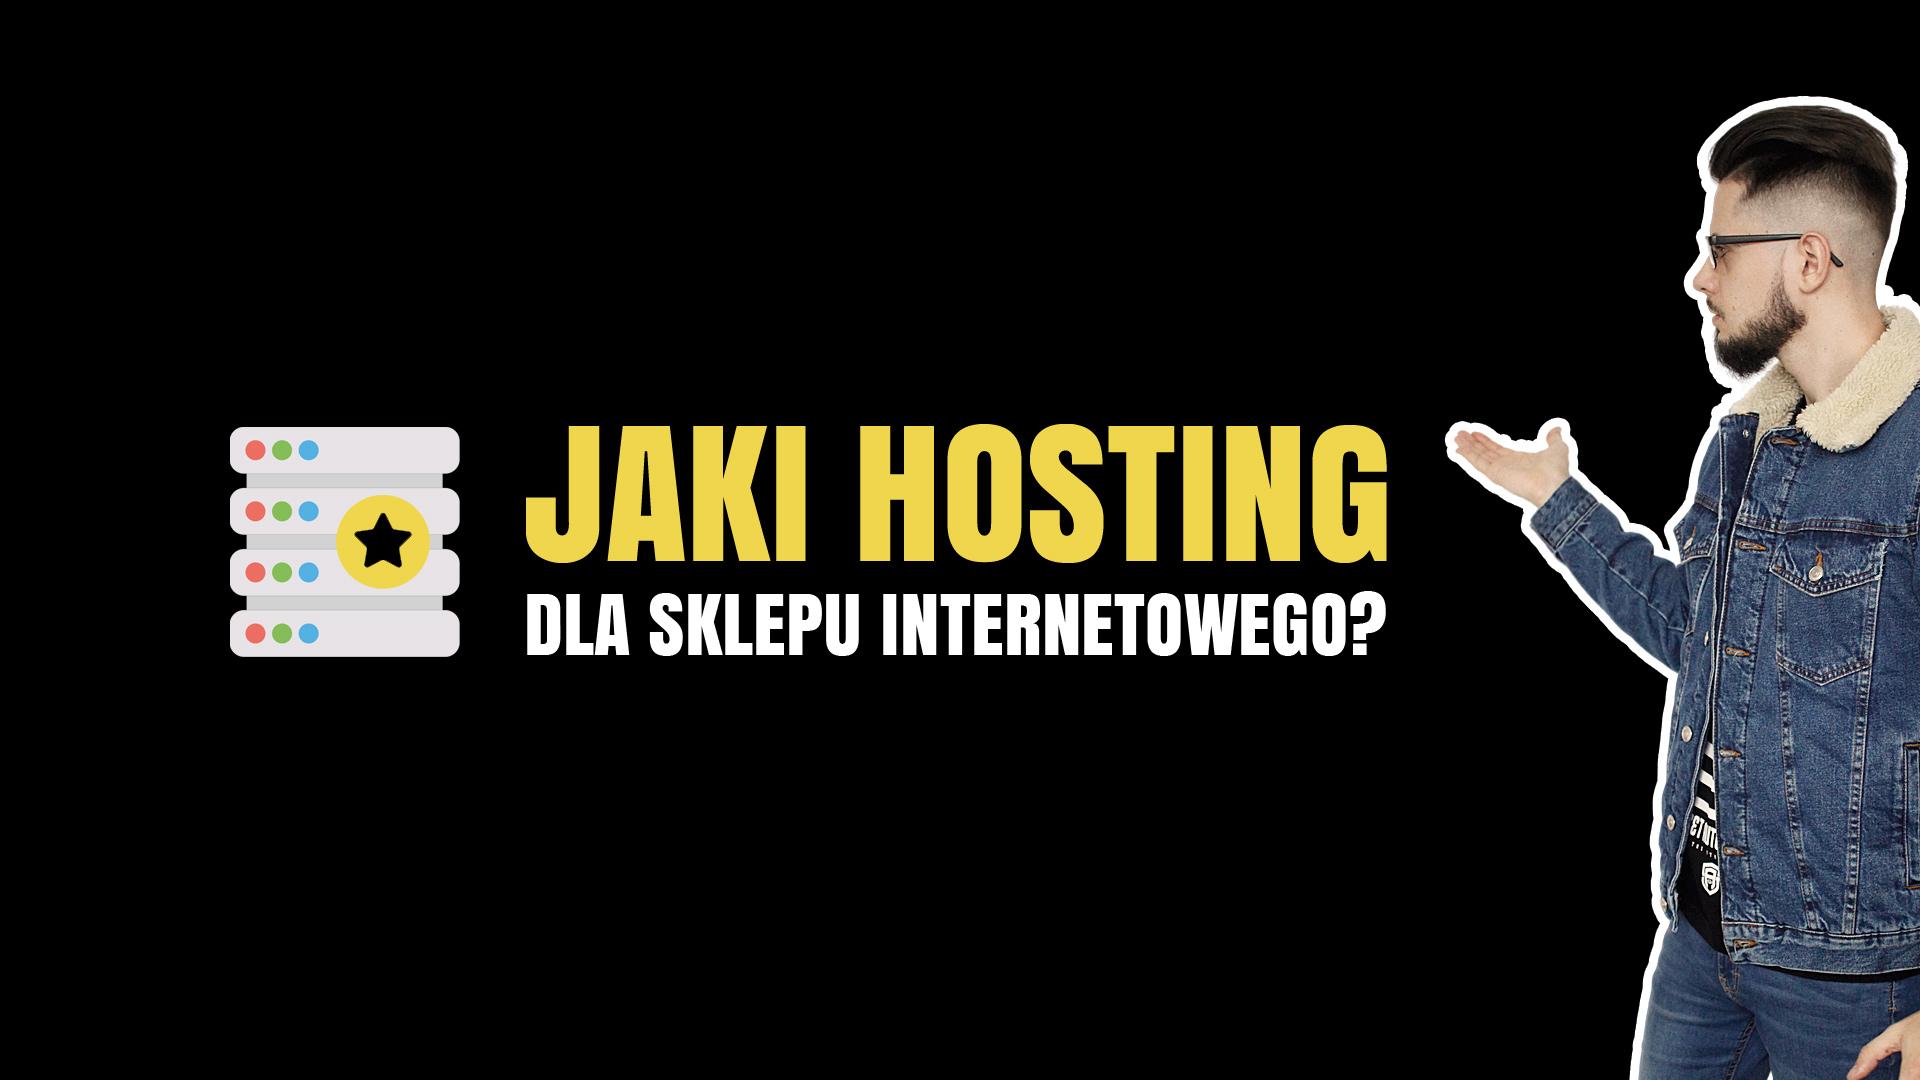 Jaki hosting dla sklepu internetowego?